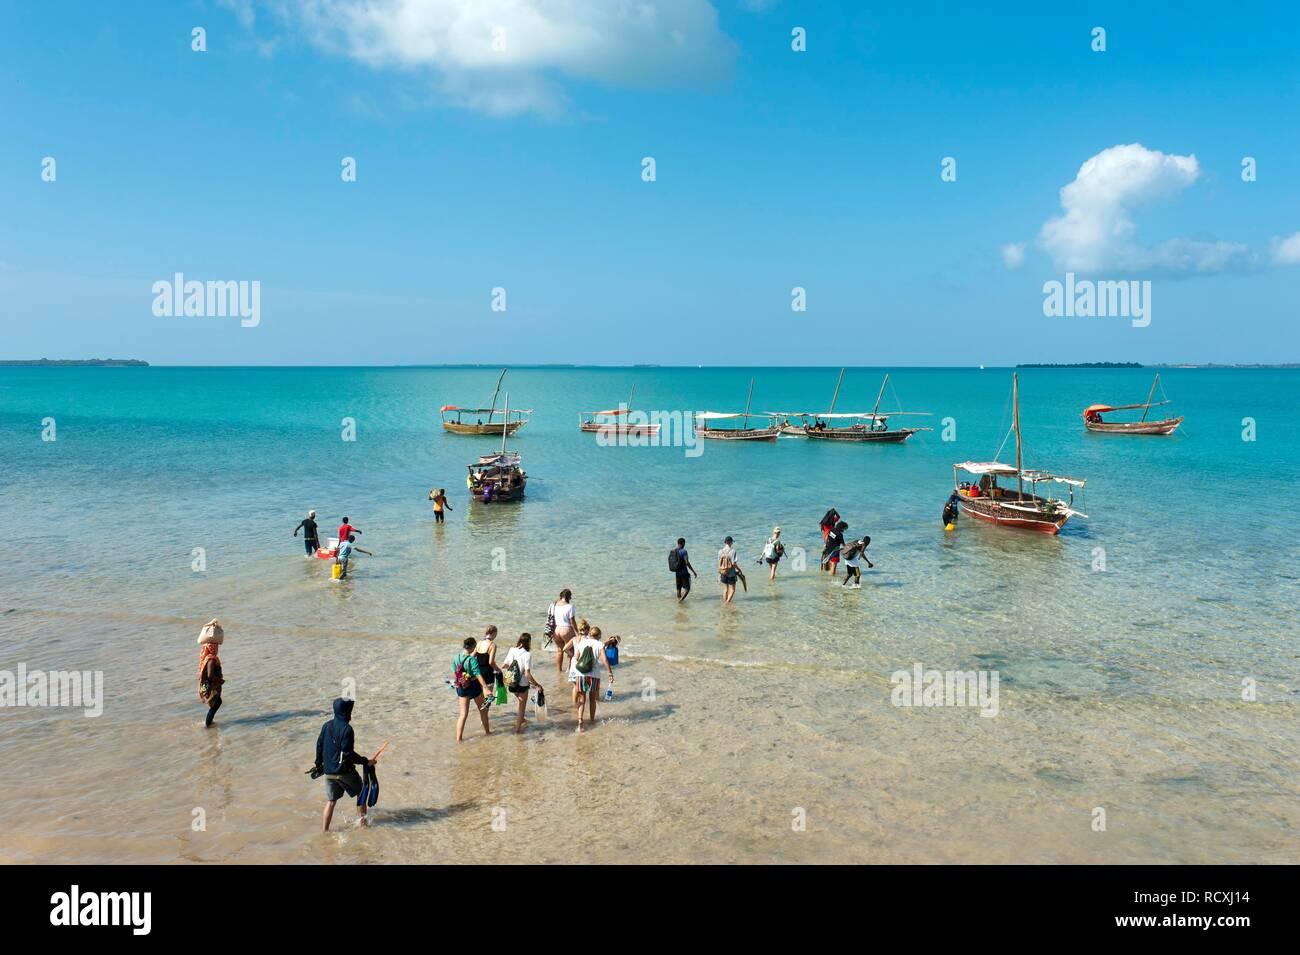 Tourists wade through the shallow water to boats, Menai Conservation Area, Zanzibar, Tanzania - Stock Image